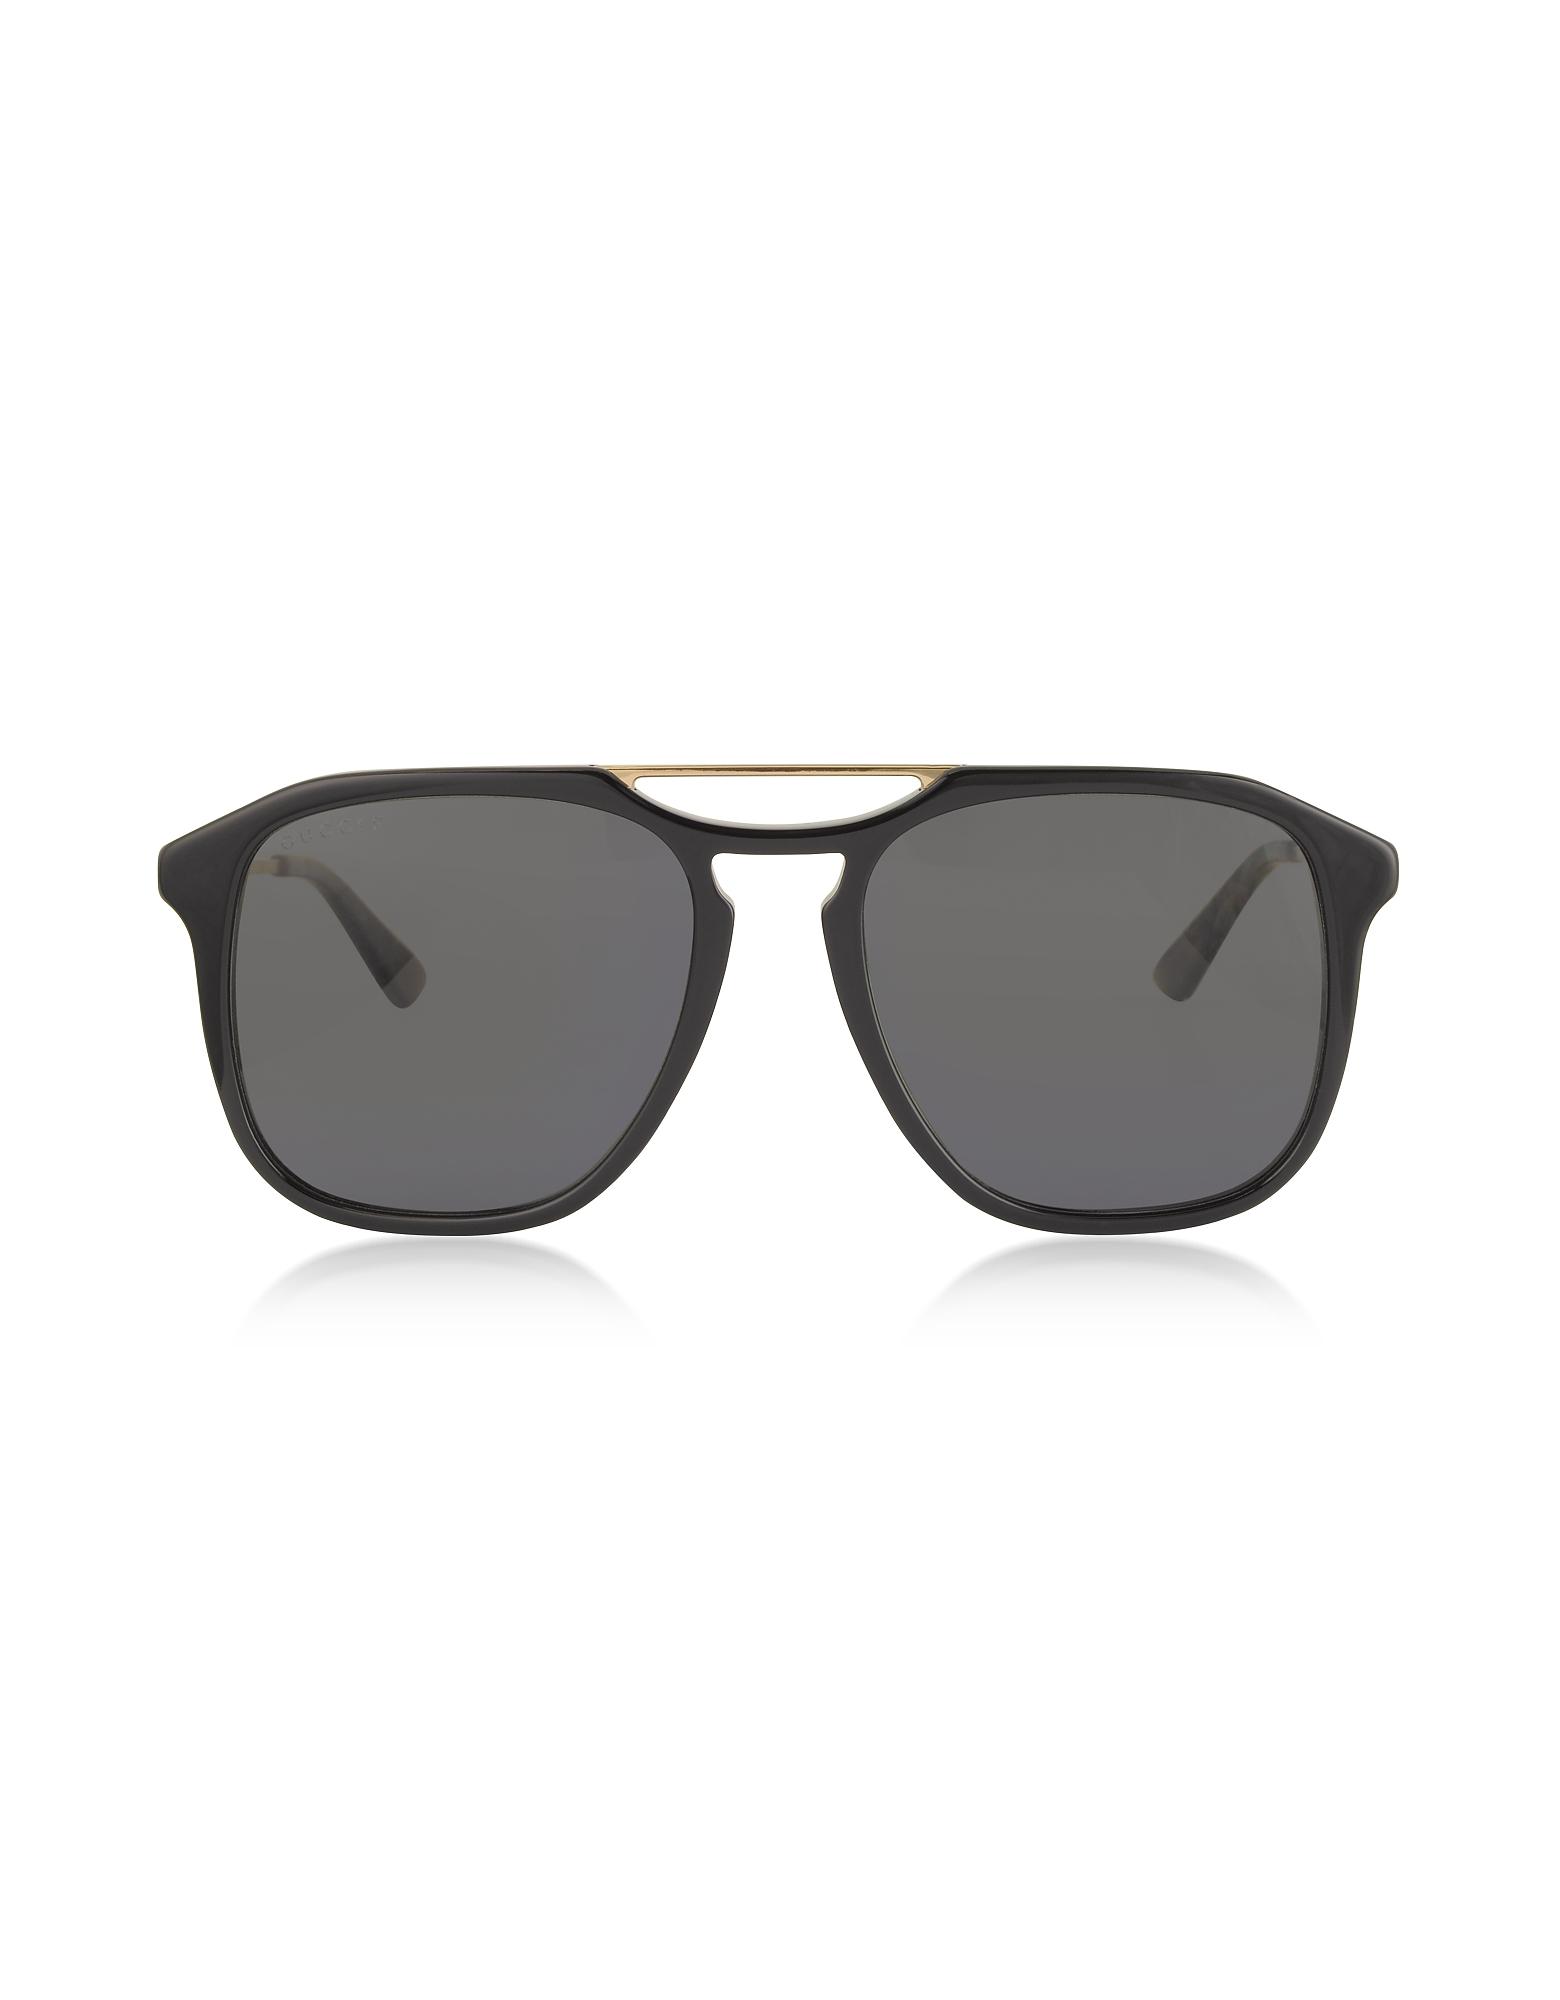 Gucci Designer Sunglasses, Square-frame Acetate Sunglasses